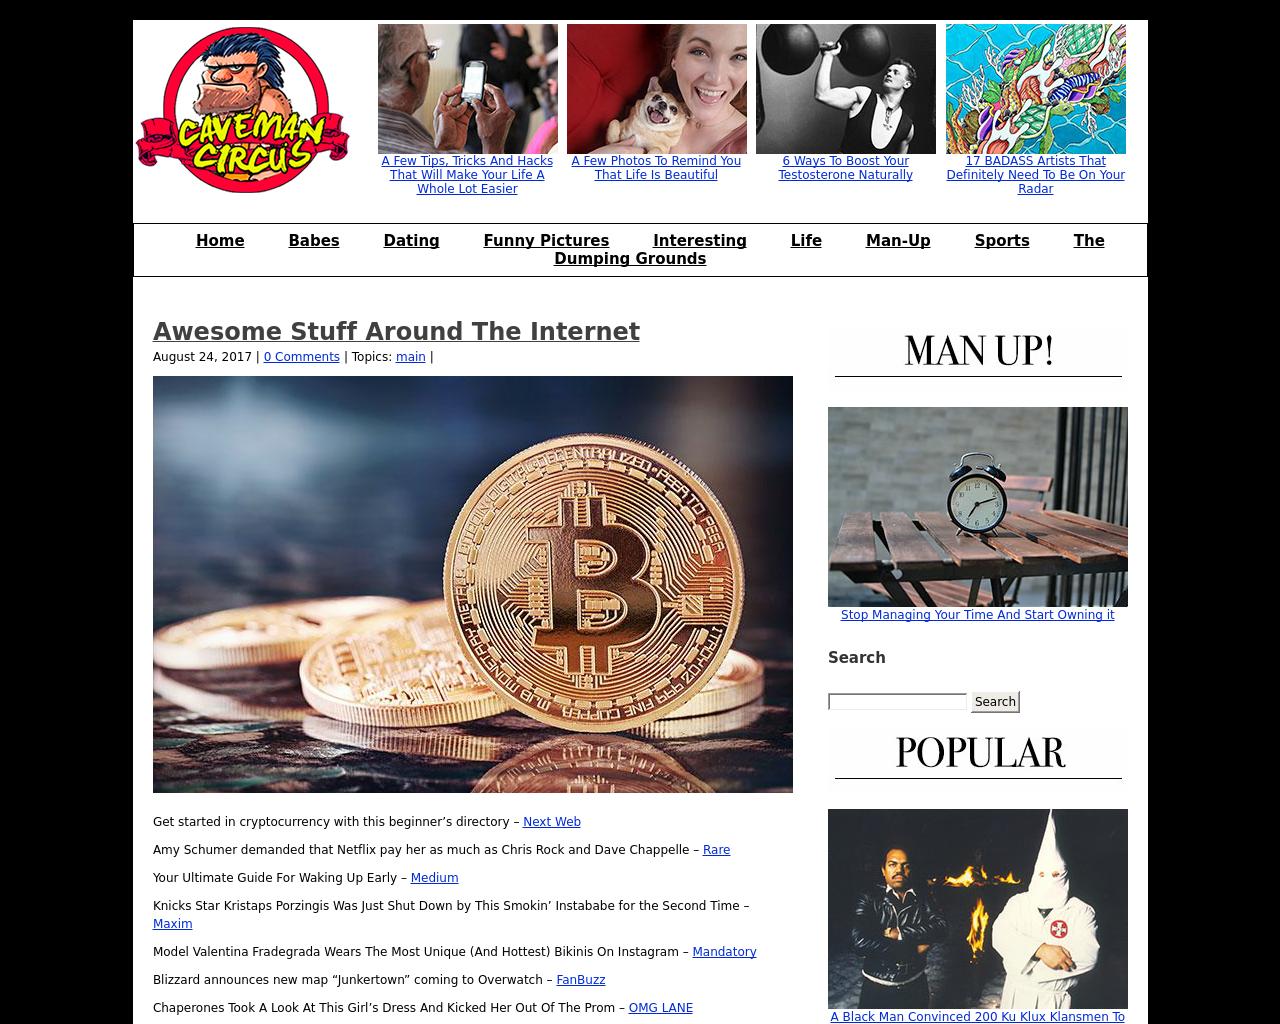 Caveman-Circus-Advertising-Reviews-Pricing